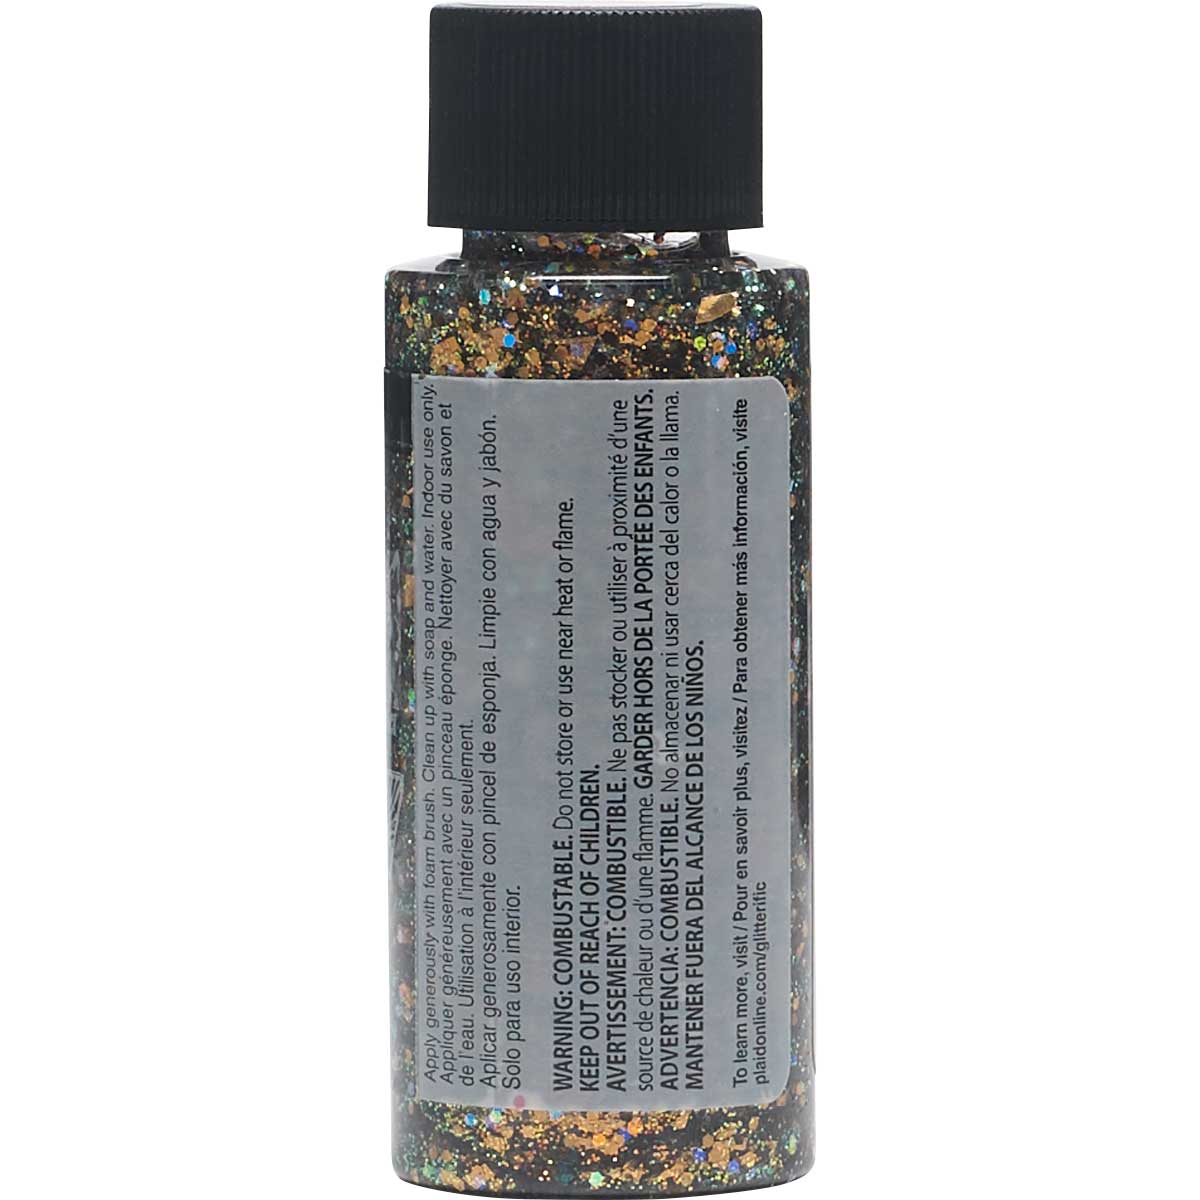 FolkArt ® Glitterific™ Acrylic Paint - Cinnamon, 2 oz.